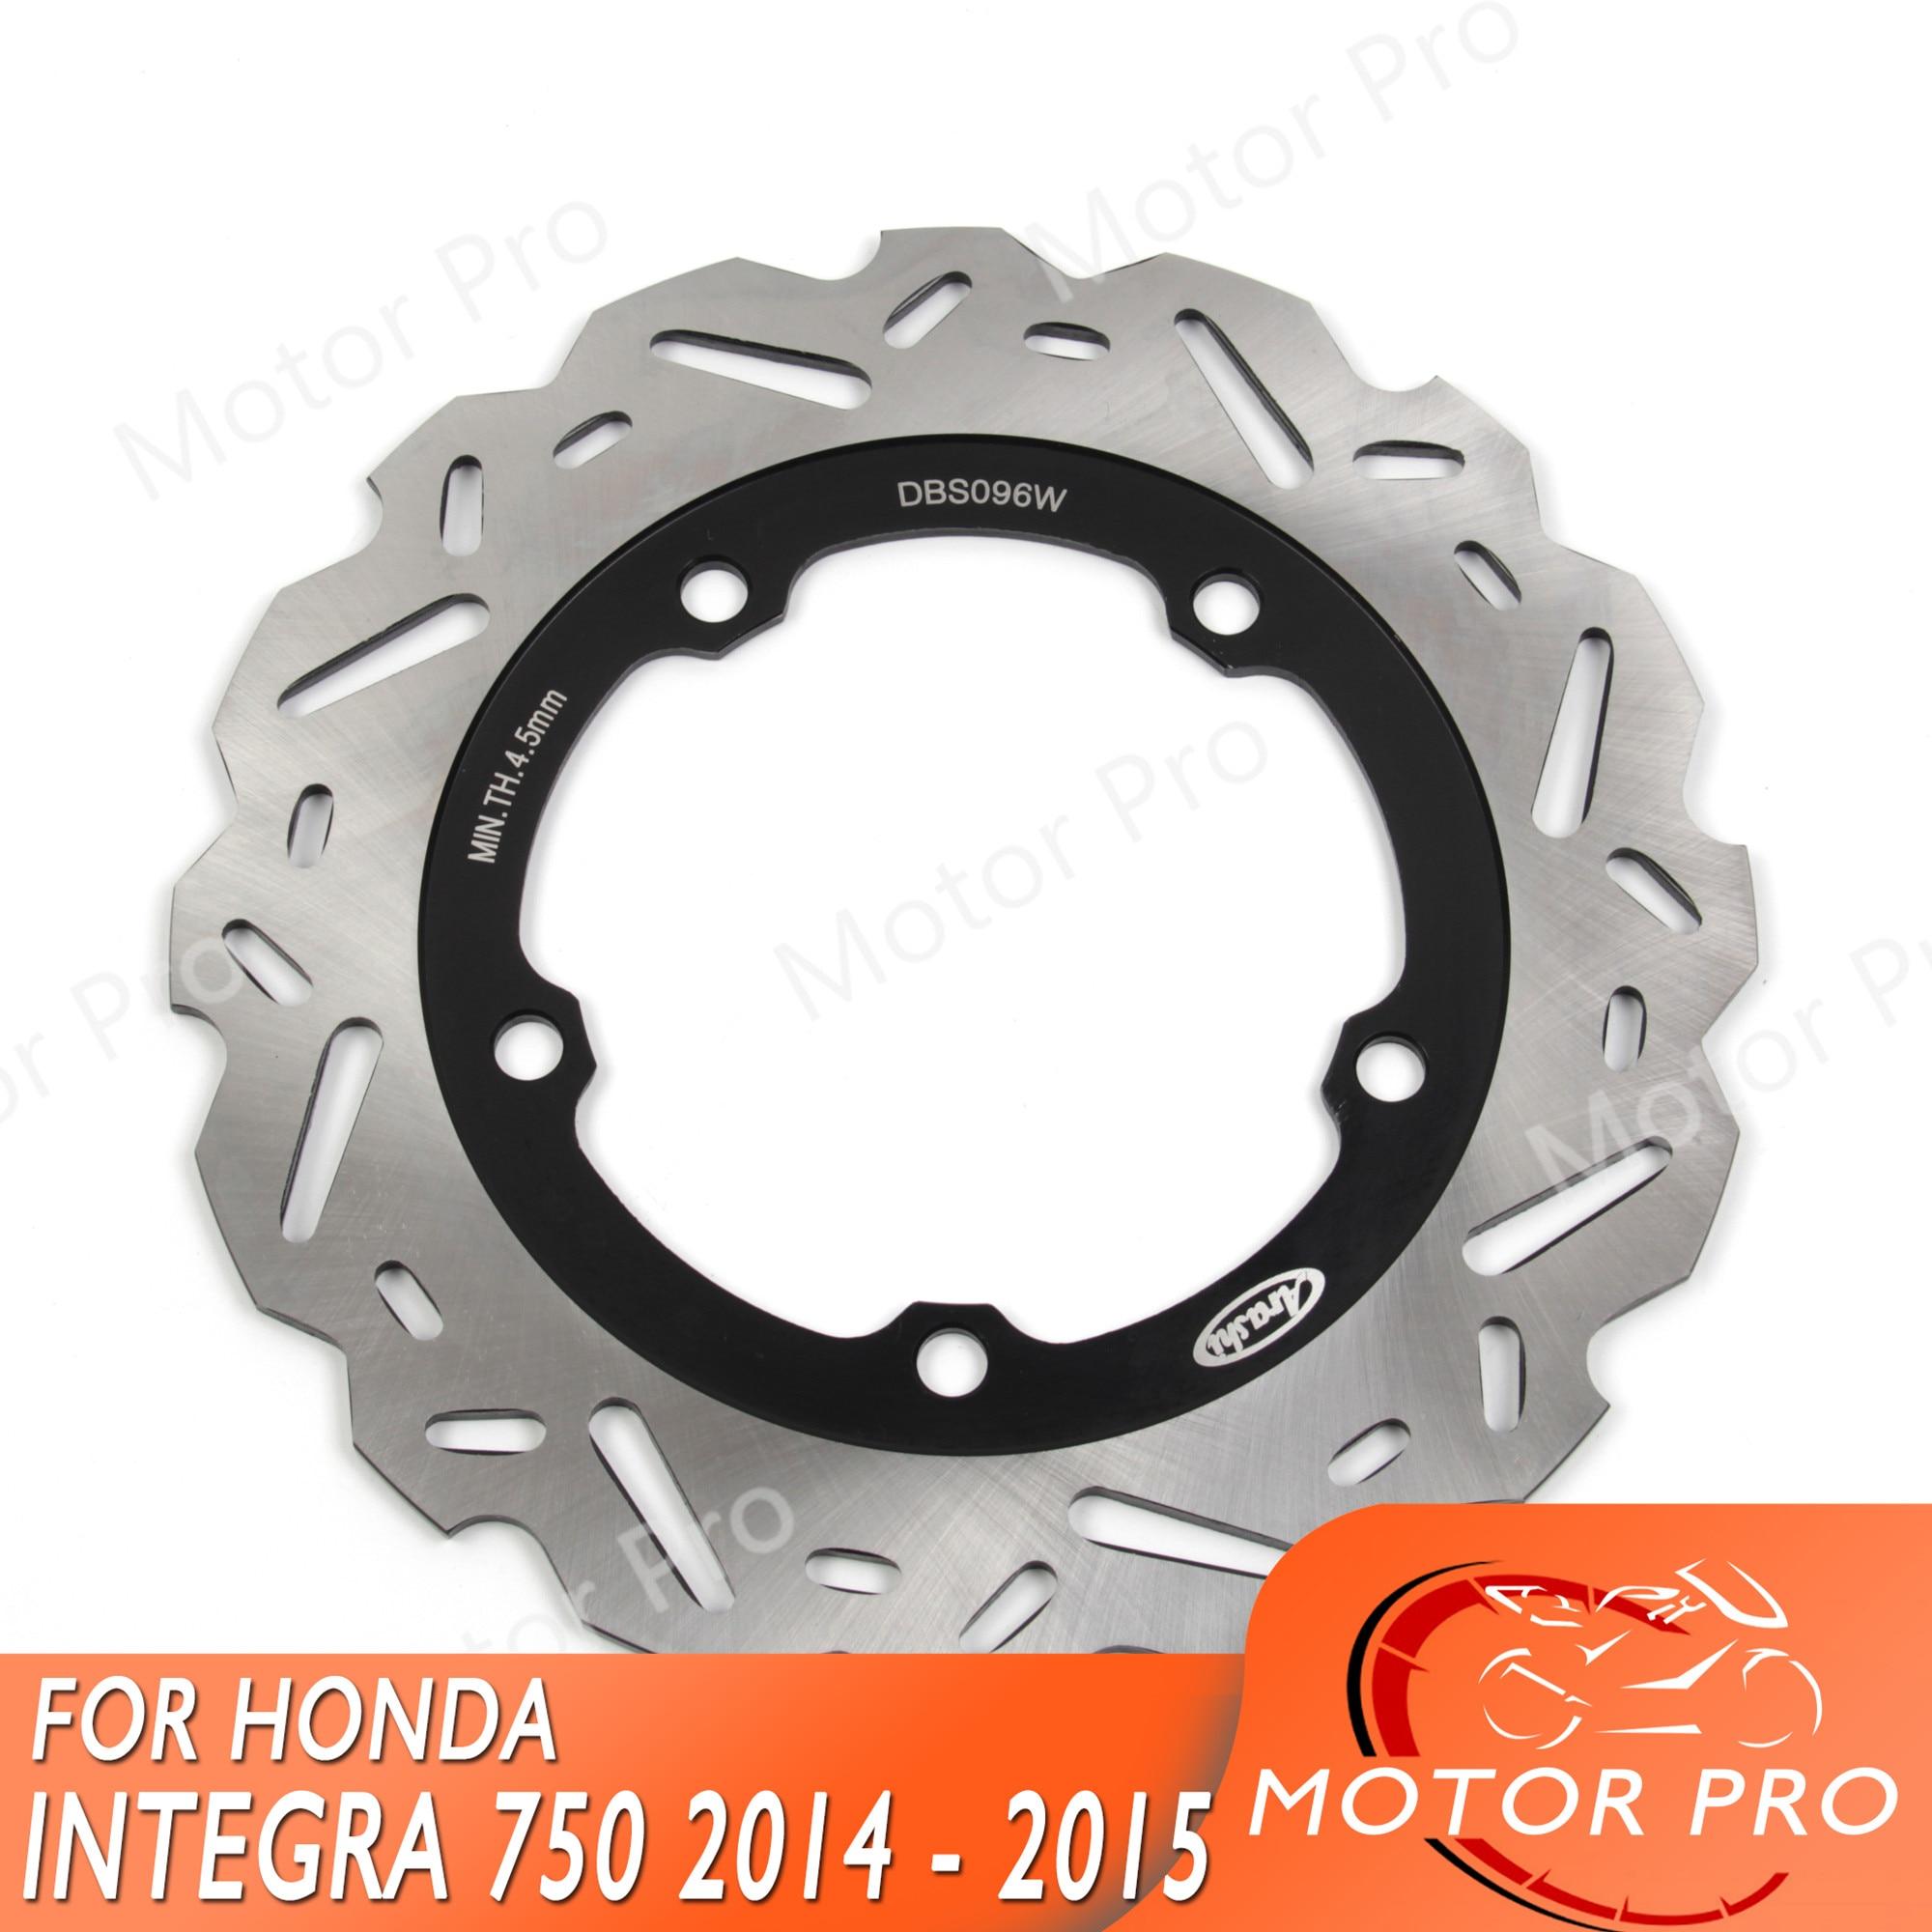 NC750S DCT Rear Brake Disc For Honda INTEGRA 750 2014 2015 Motorcycle Brake disk Rotors NC 750 S NC750 750S 750X NM4 VULTUS 700-in Brake Disks from Automobiles & Motorcycles    1